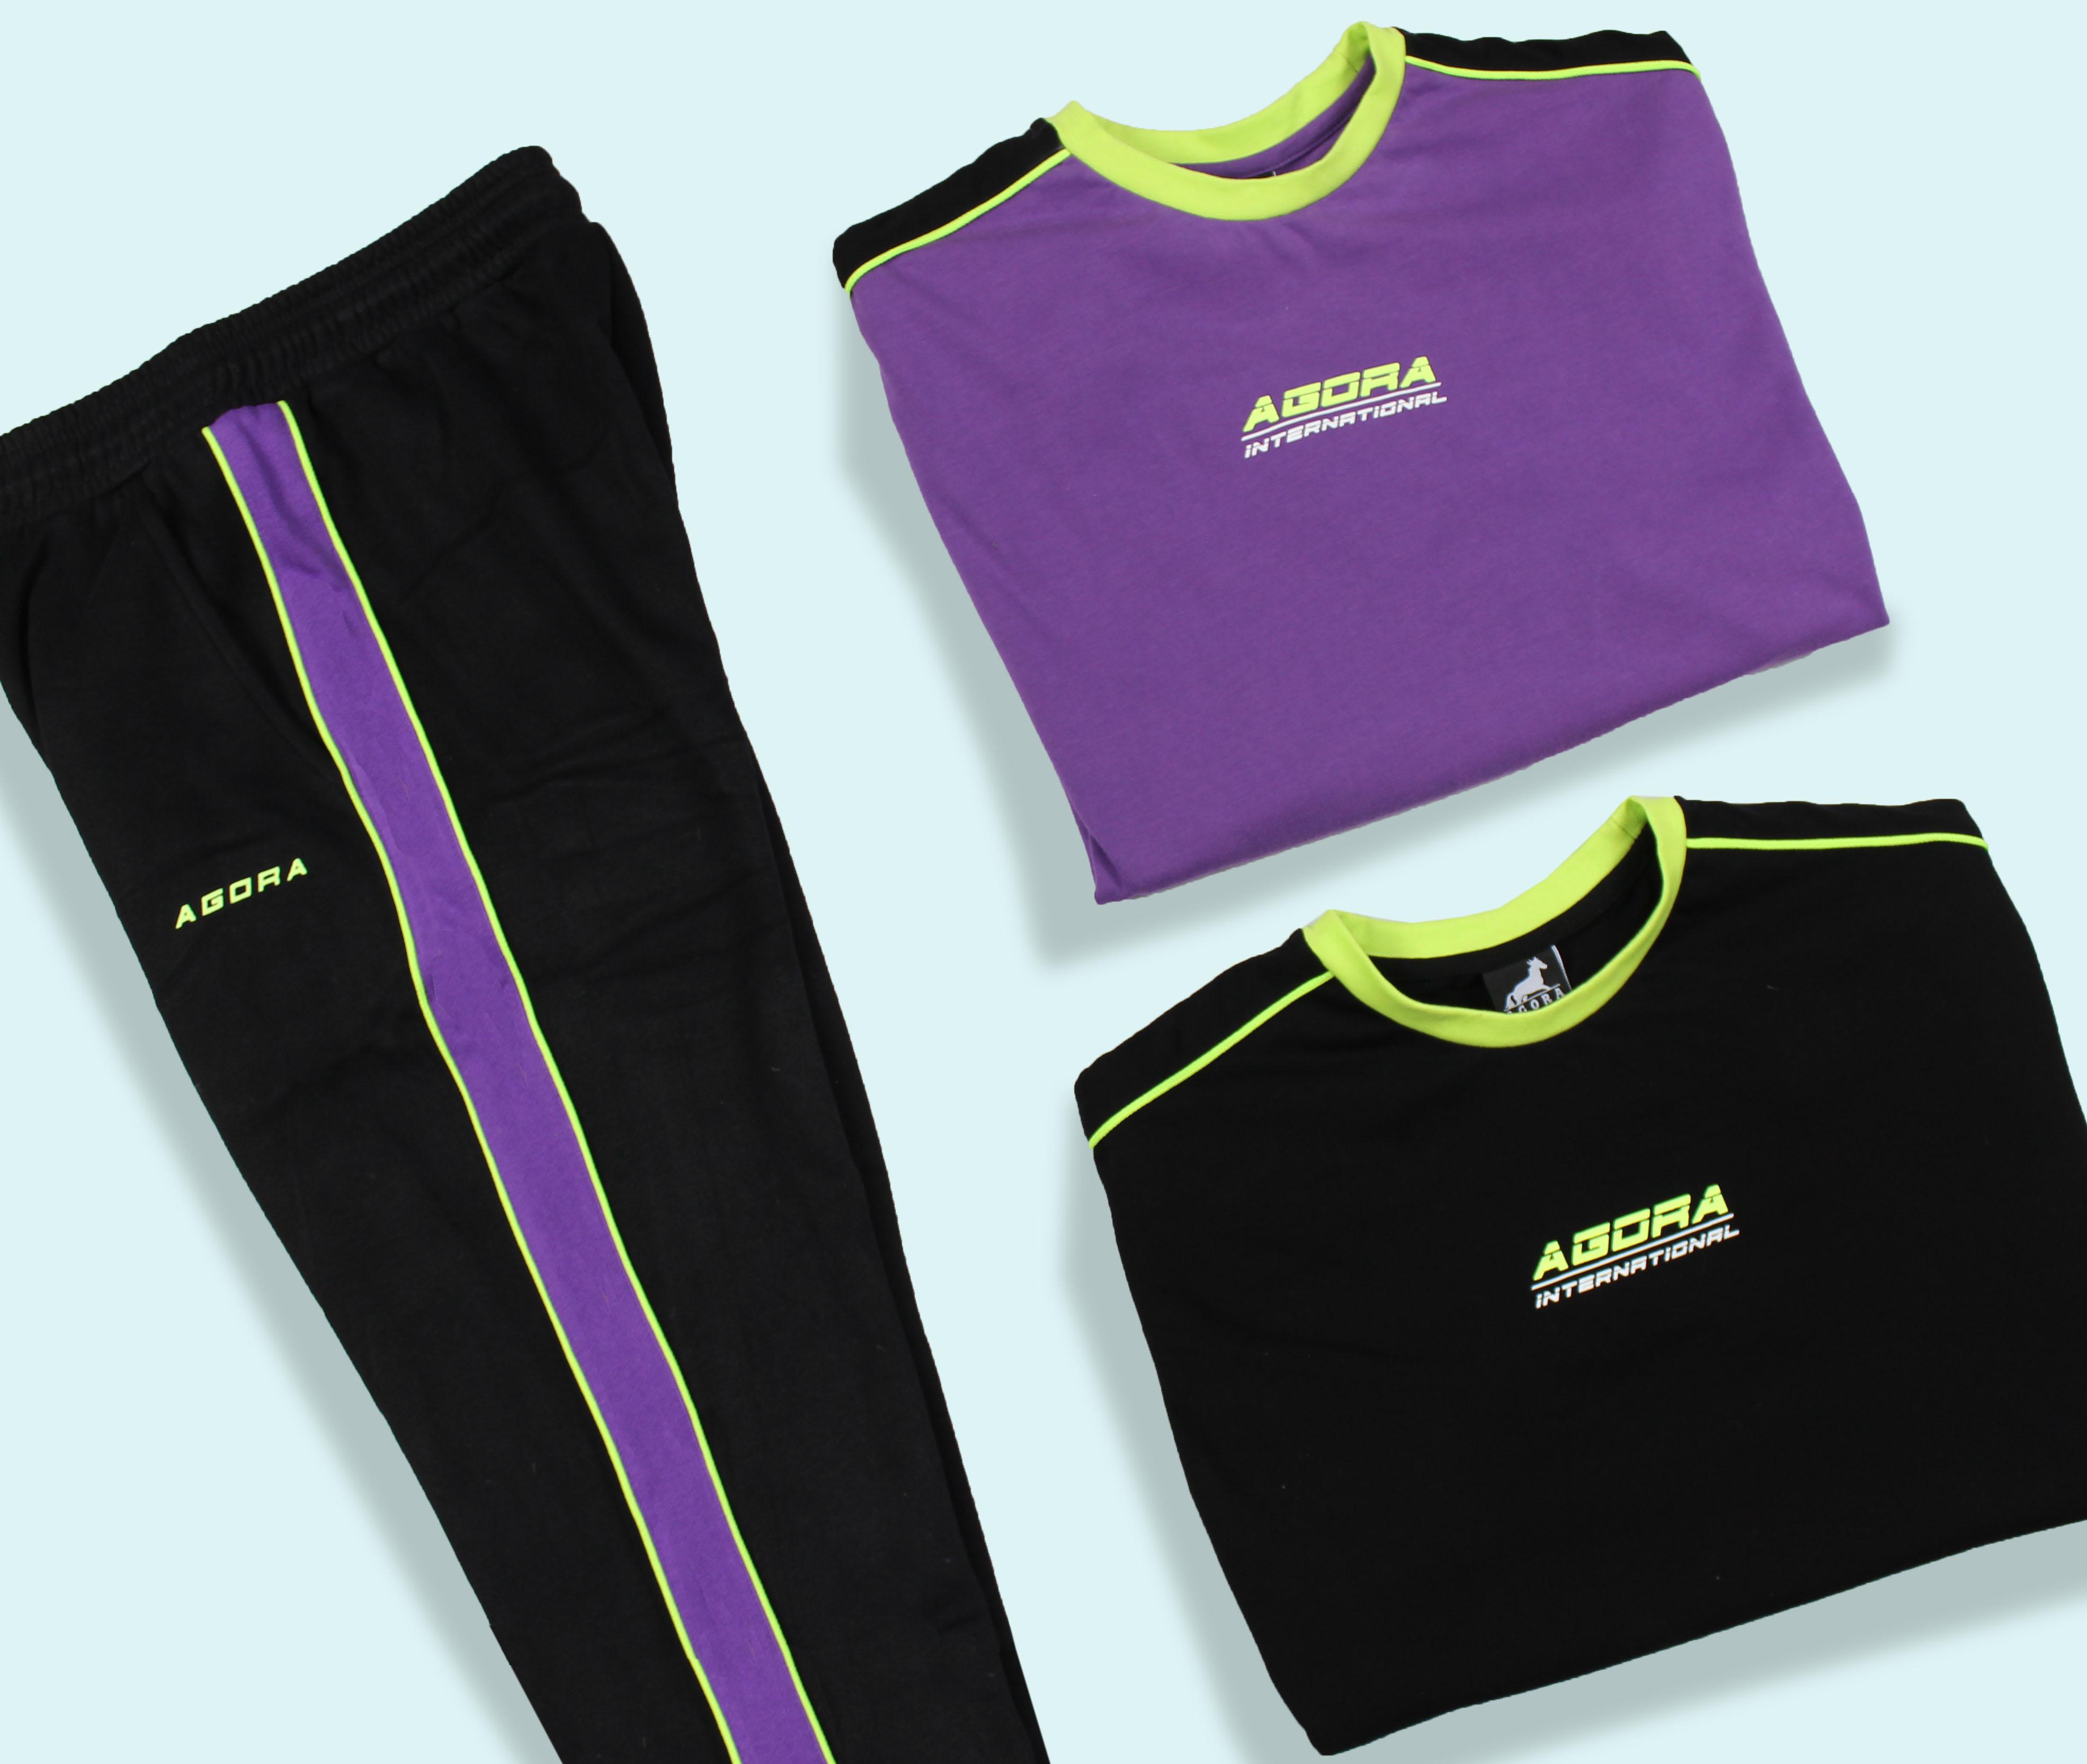 Agora Clothing Blog - Vintage, Streetwear and fashion